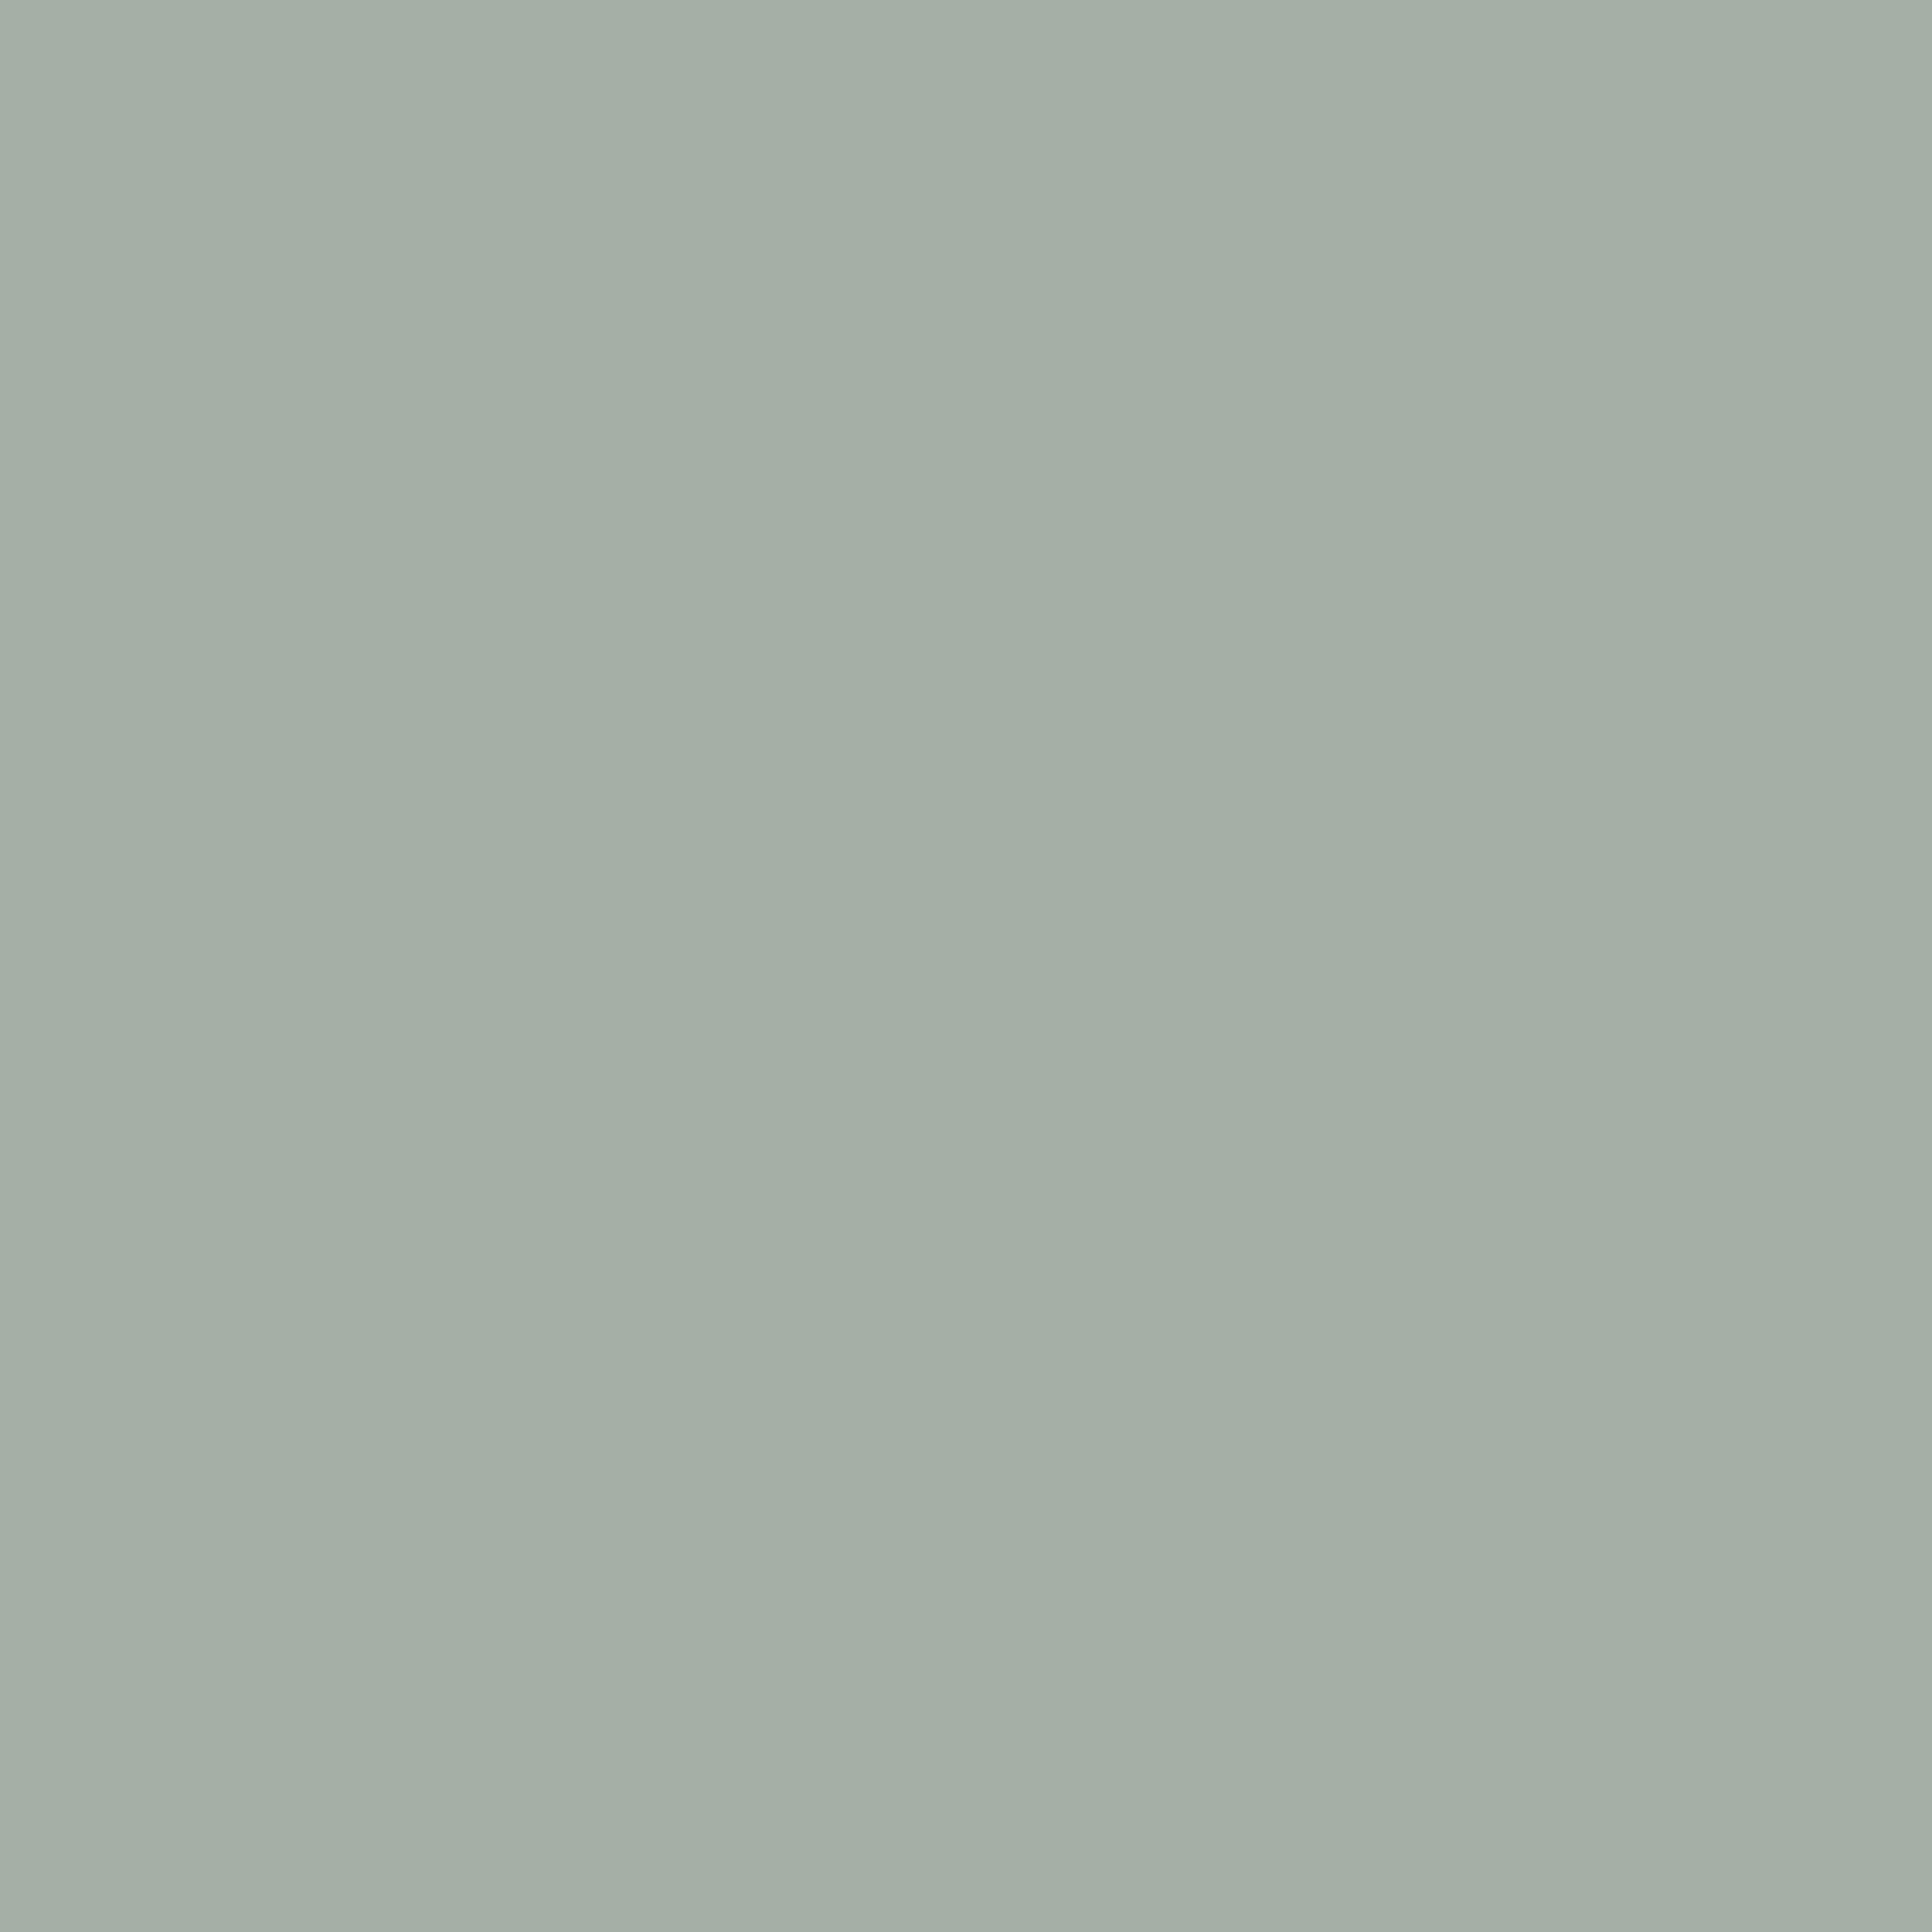 flexa early dew kopen : Flexa Creations Muurverf Extra Mat Early Dew 1 L Diversen